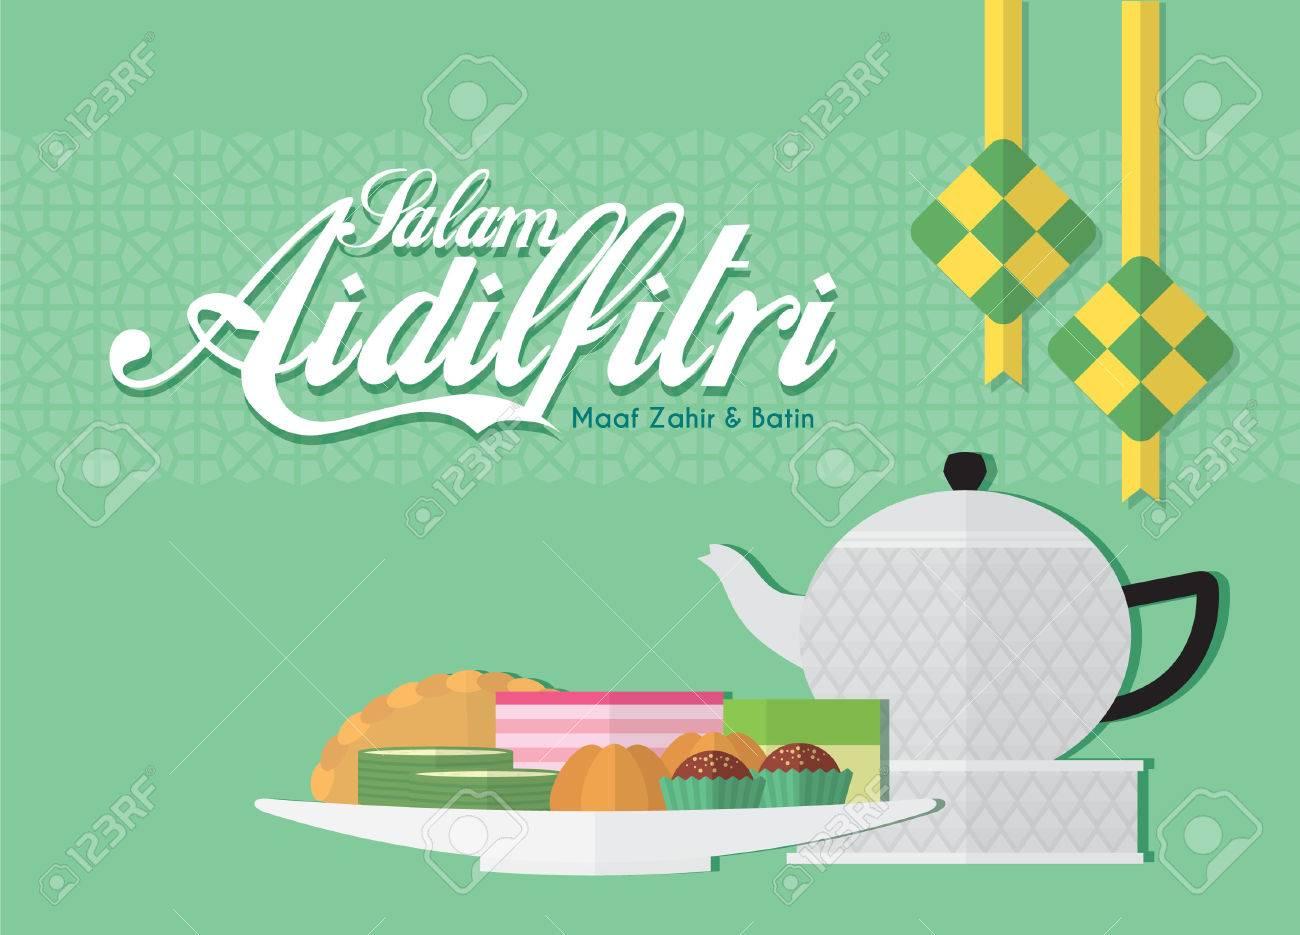 Raya greetings with ketupat rice dumpling kuih muih malay raya greetings with ketupat rice dumpling kuih muih malay pastry kristyandbryce Images